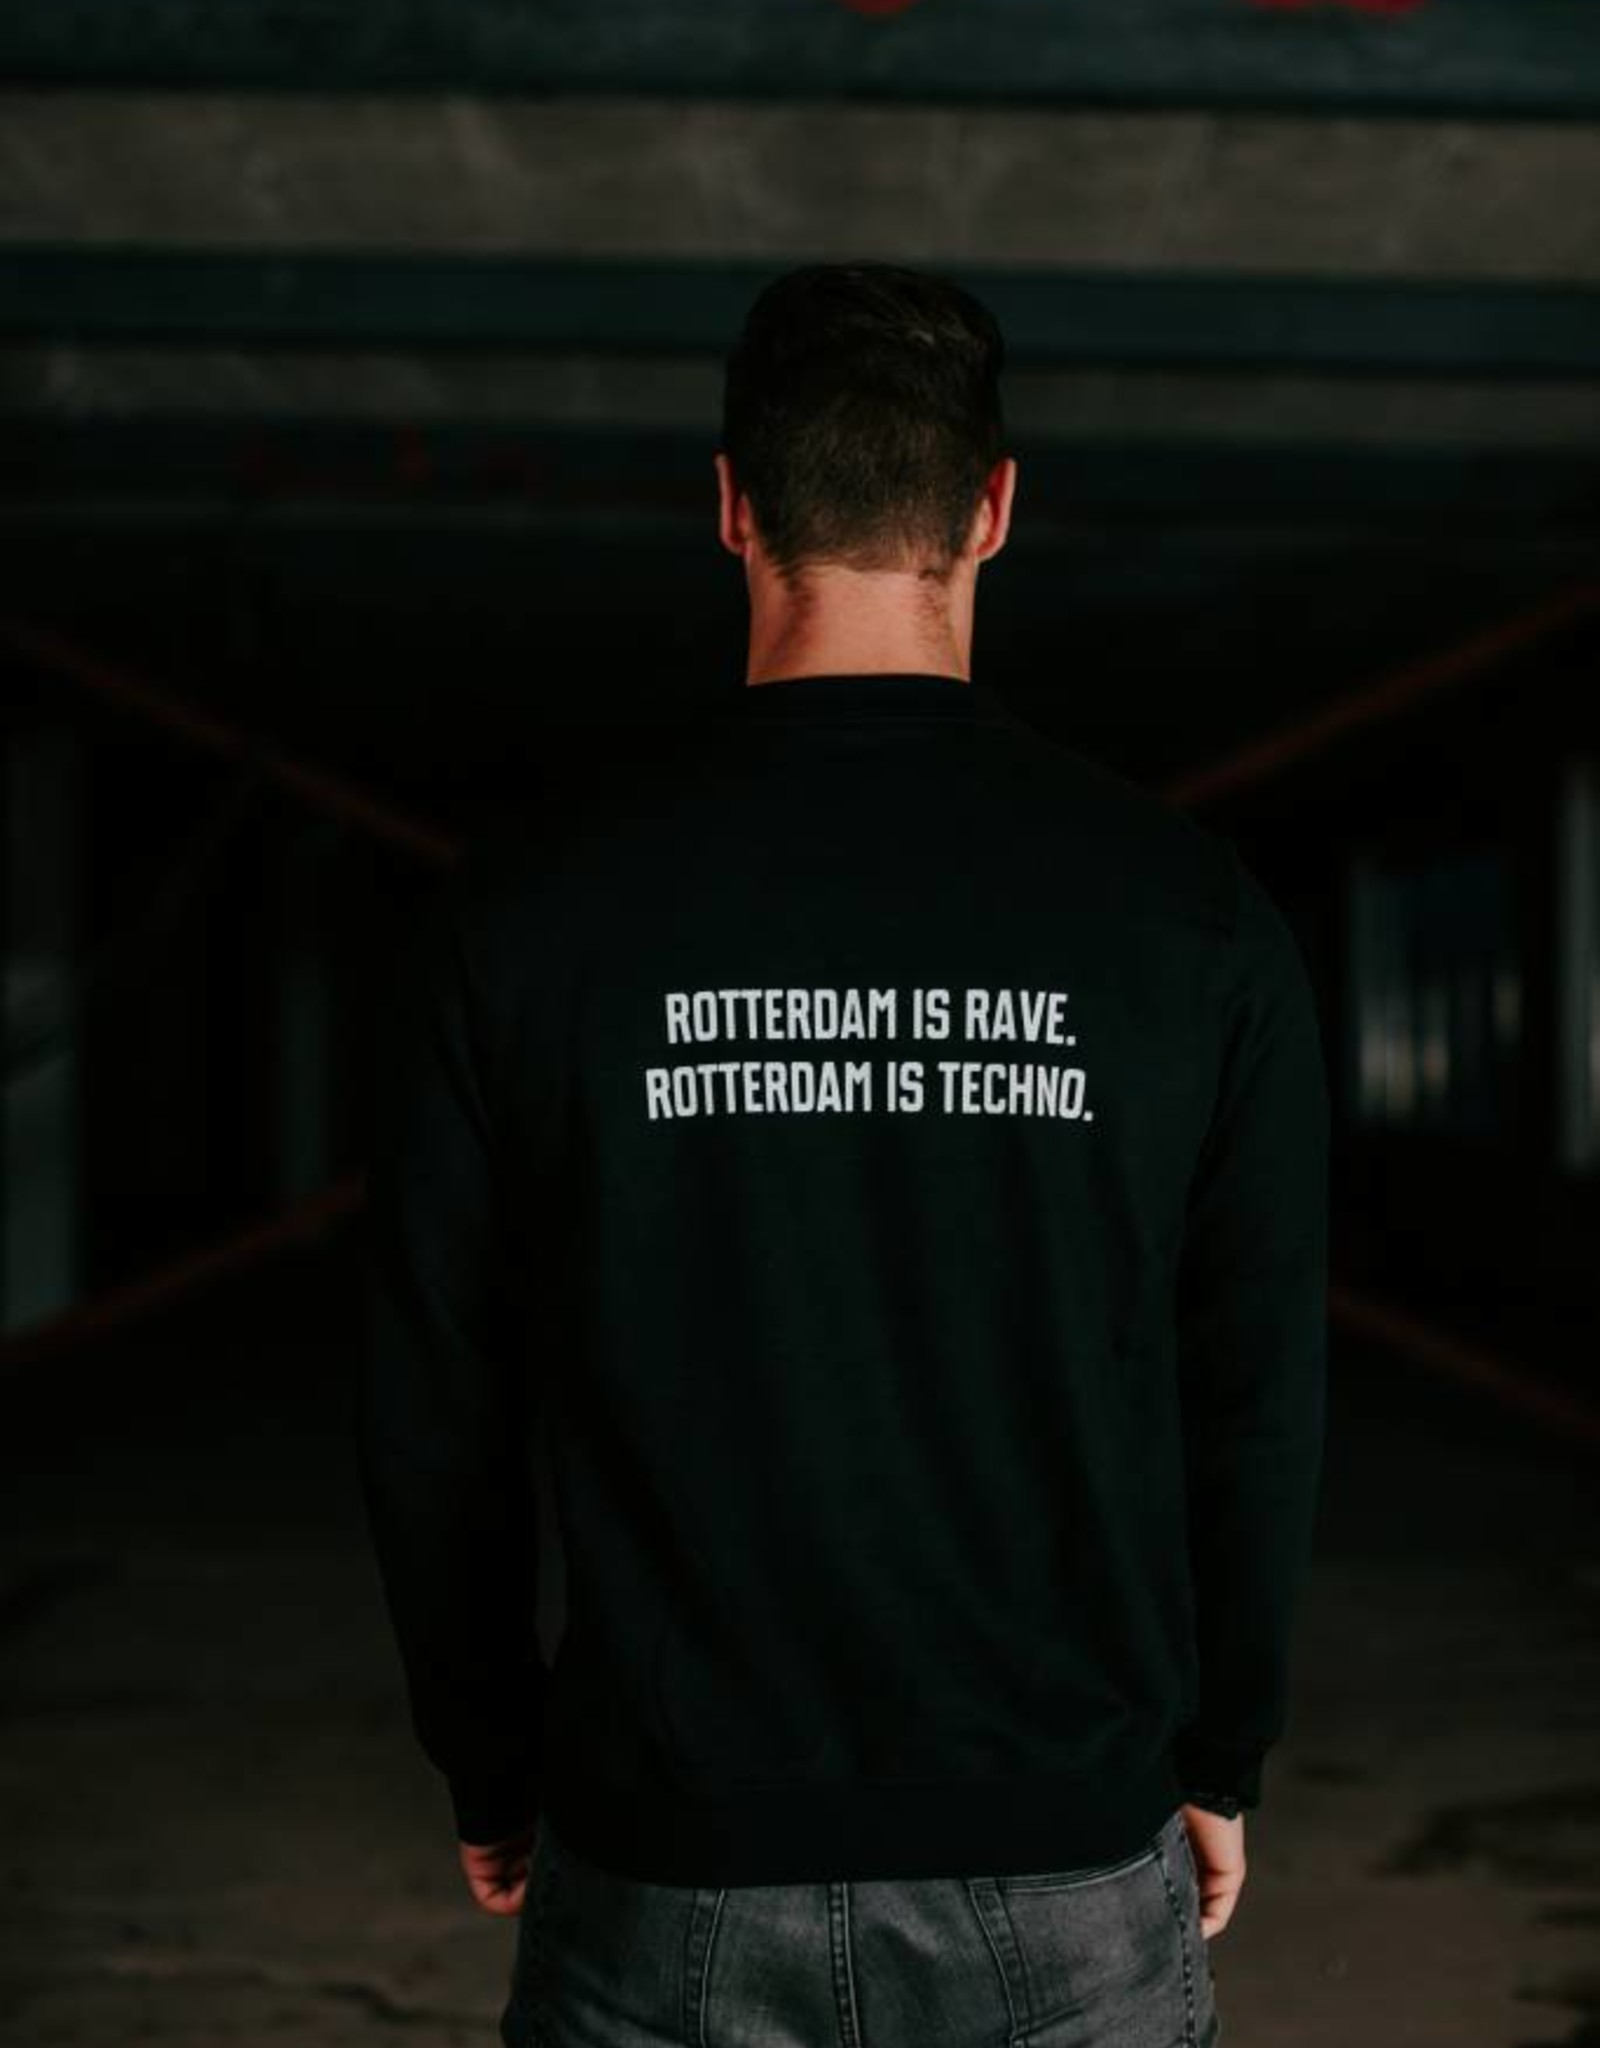 Rotterdam Rave Rotterdam Rave Crewneck Slogan (Unisex)